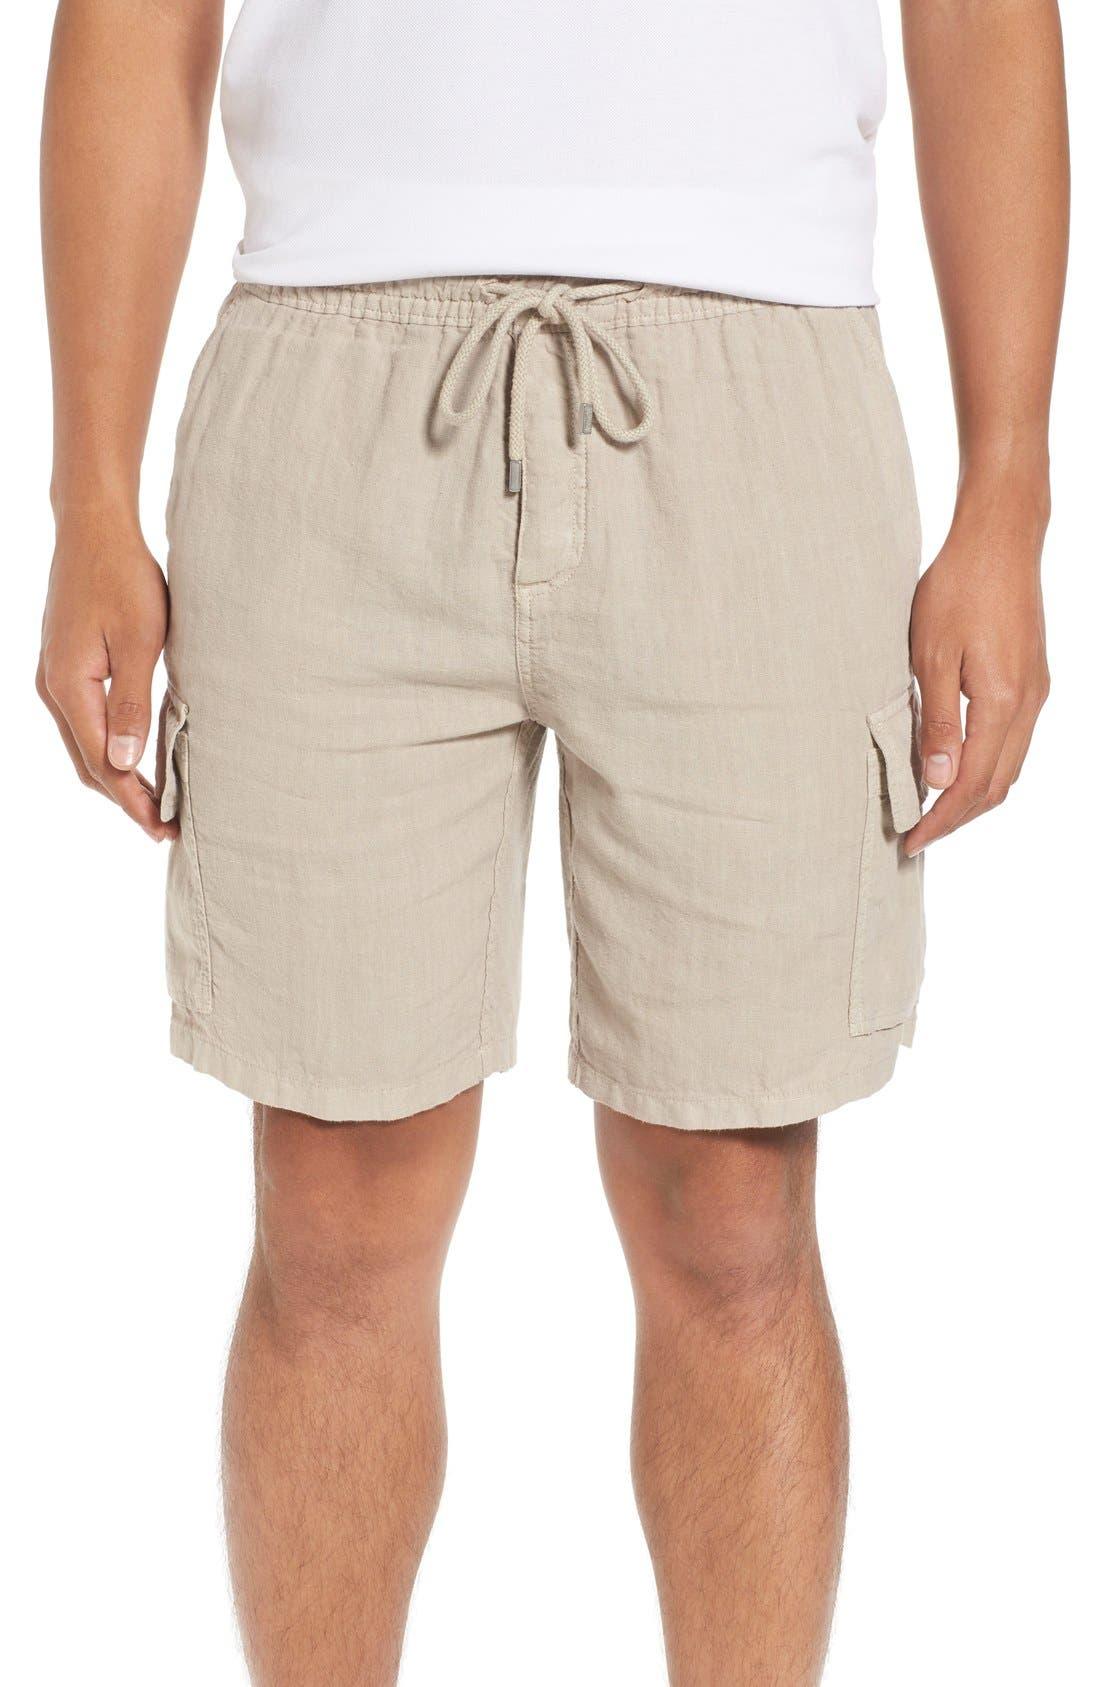 Vilbrequin Linen Cargo Shorts,                         Main,                         color, Jute